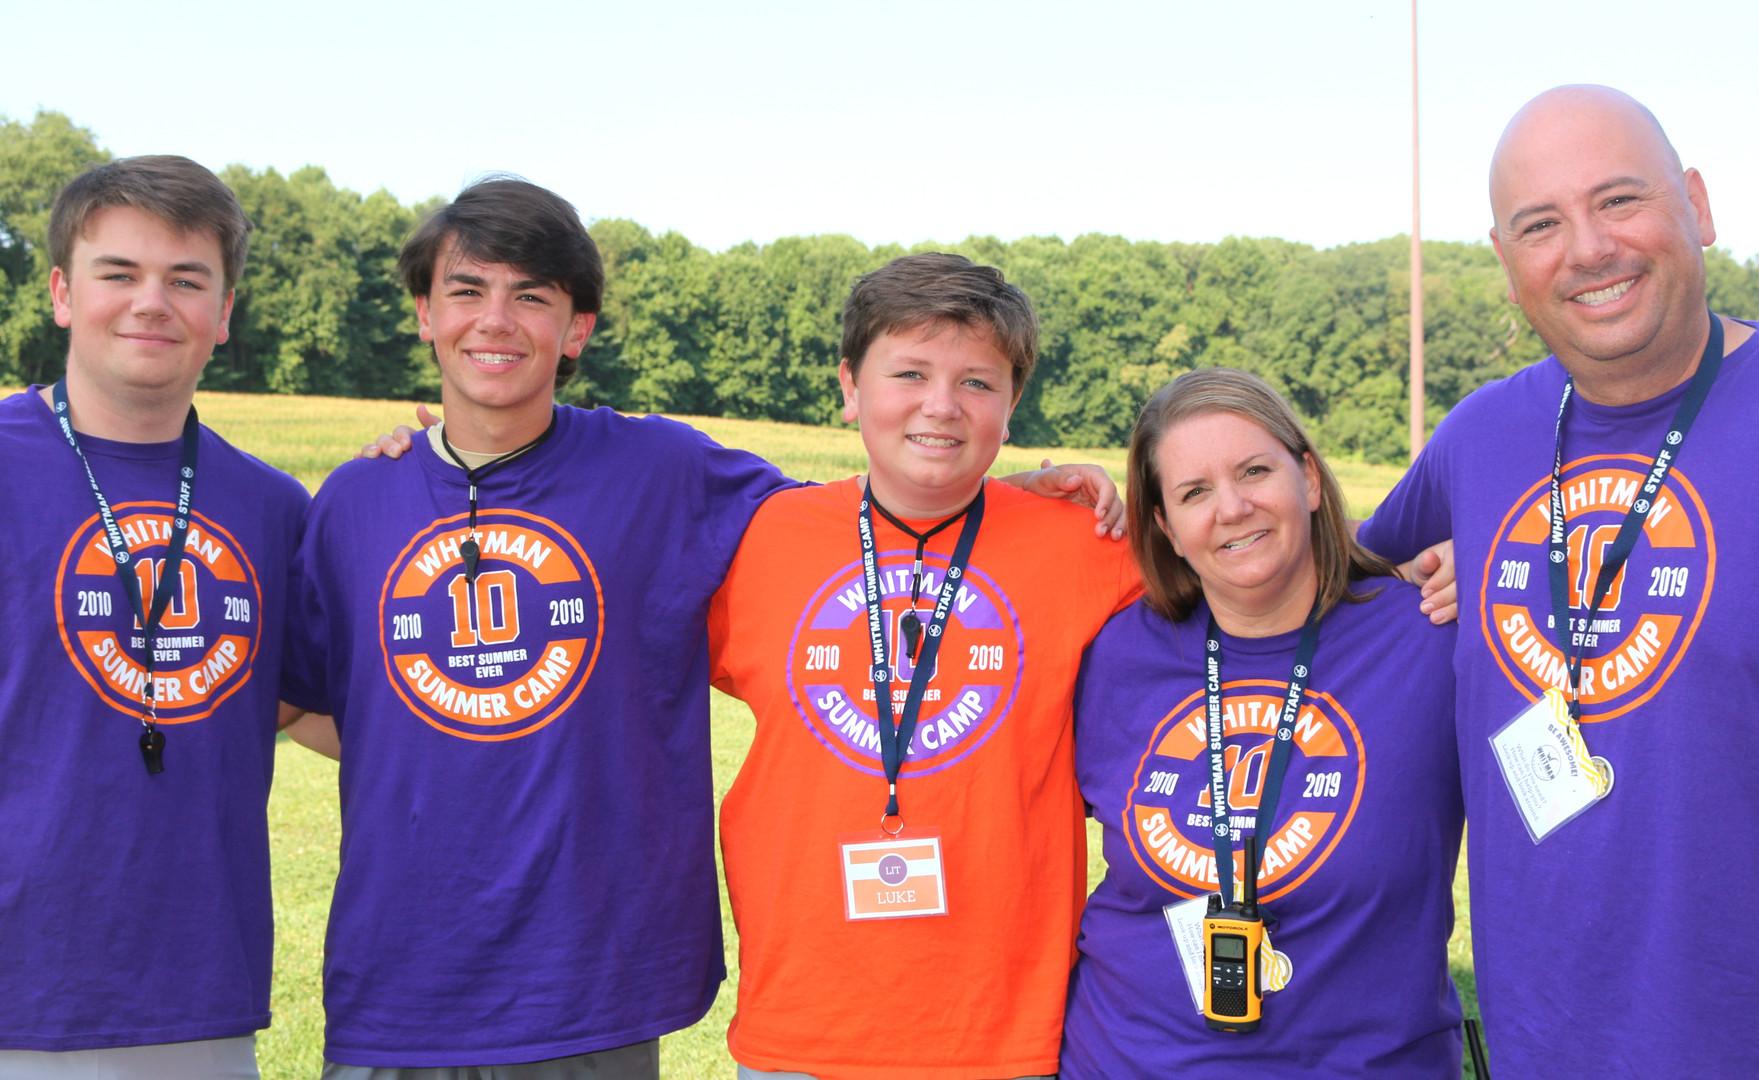 Whitman Summer Camp - Whitman Family Pic 2019